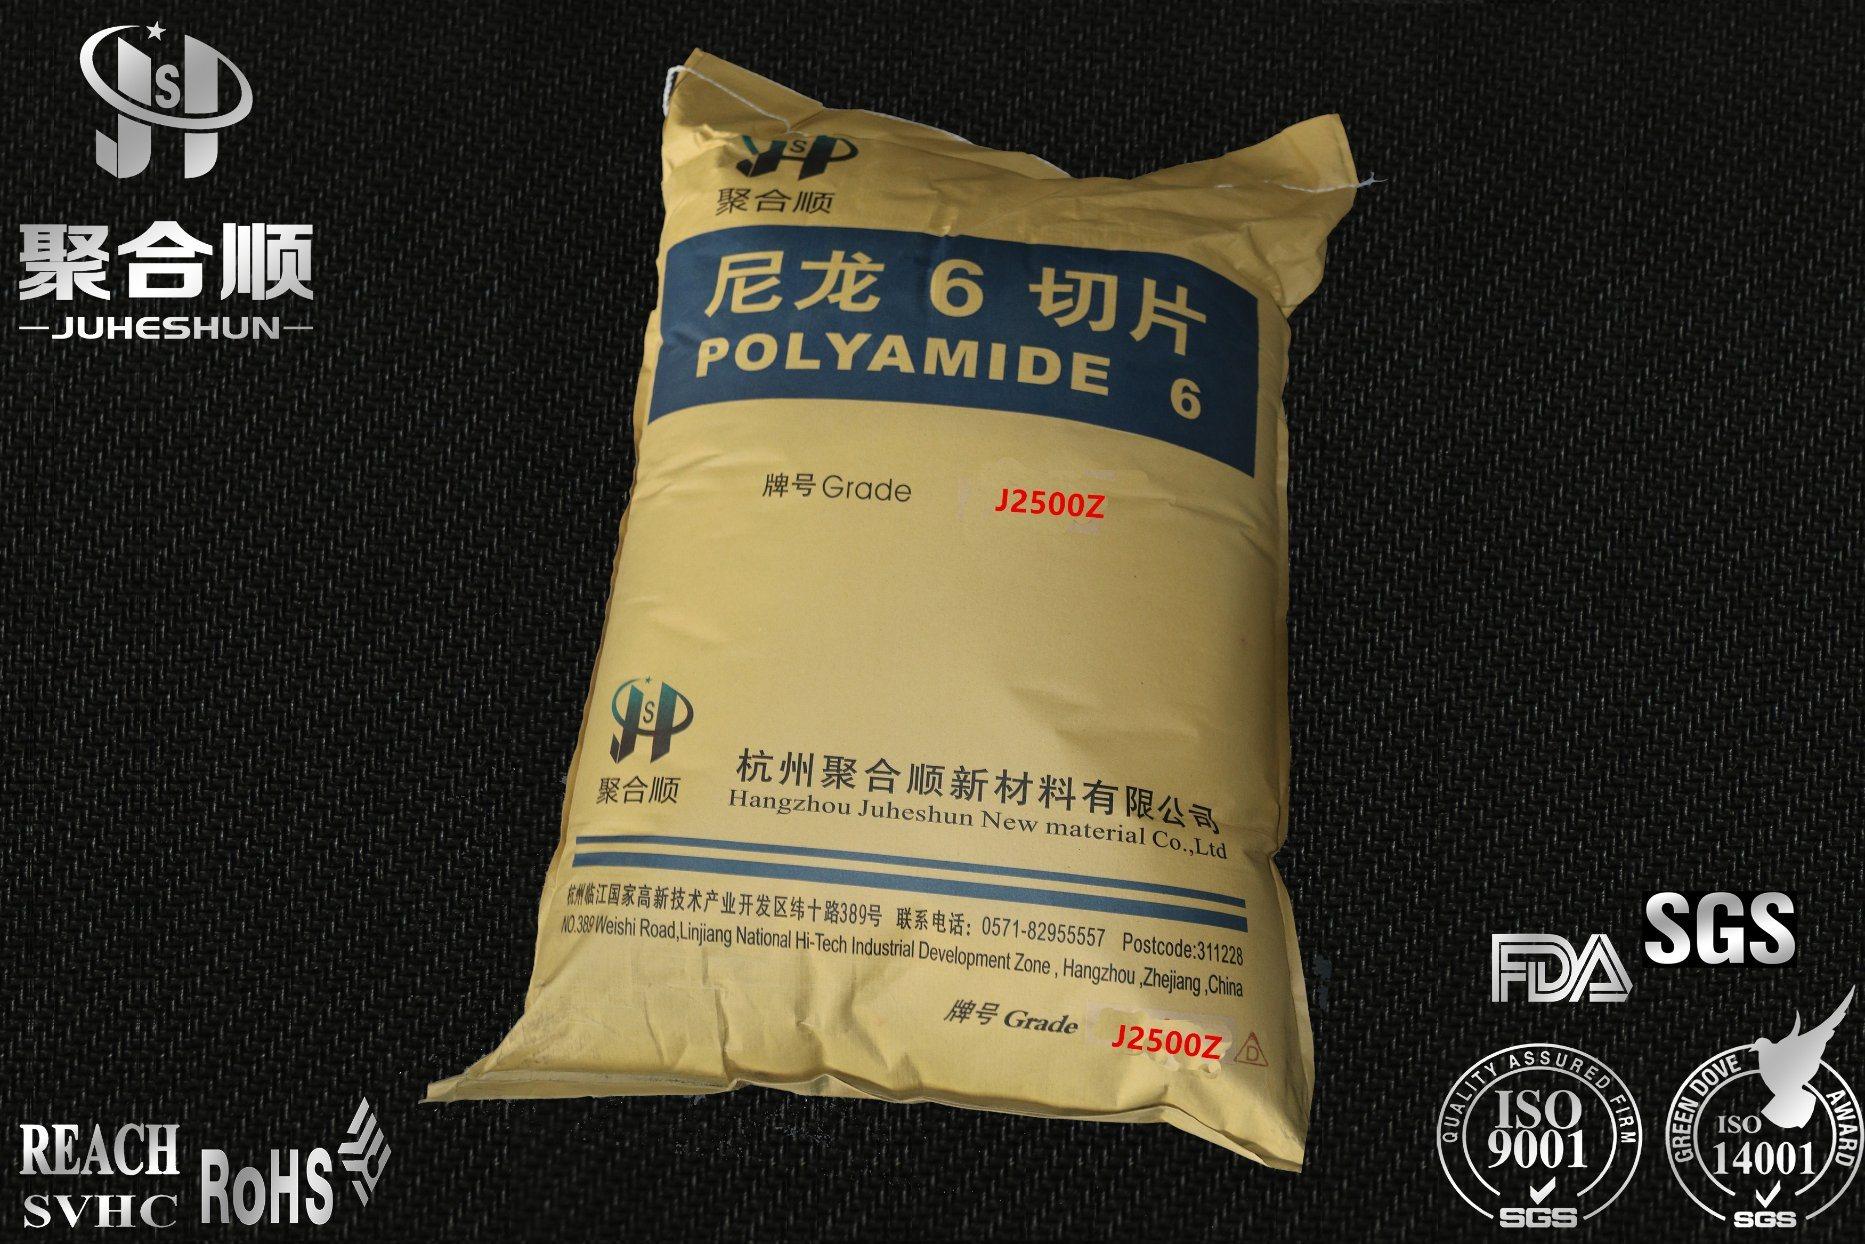 J2500z/Polyamide-6 Granules/Engineering Graded Nylon-6 Chips/Pellets/ PA6 Slice/PA6/Nylon6